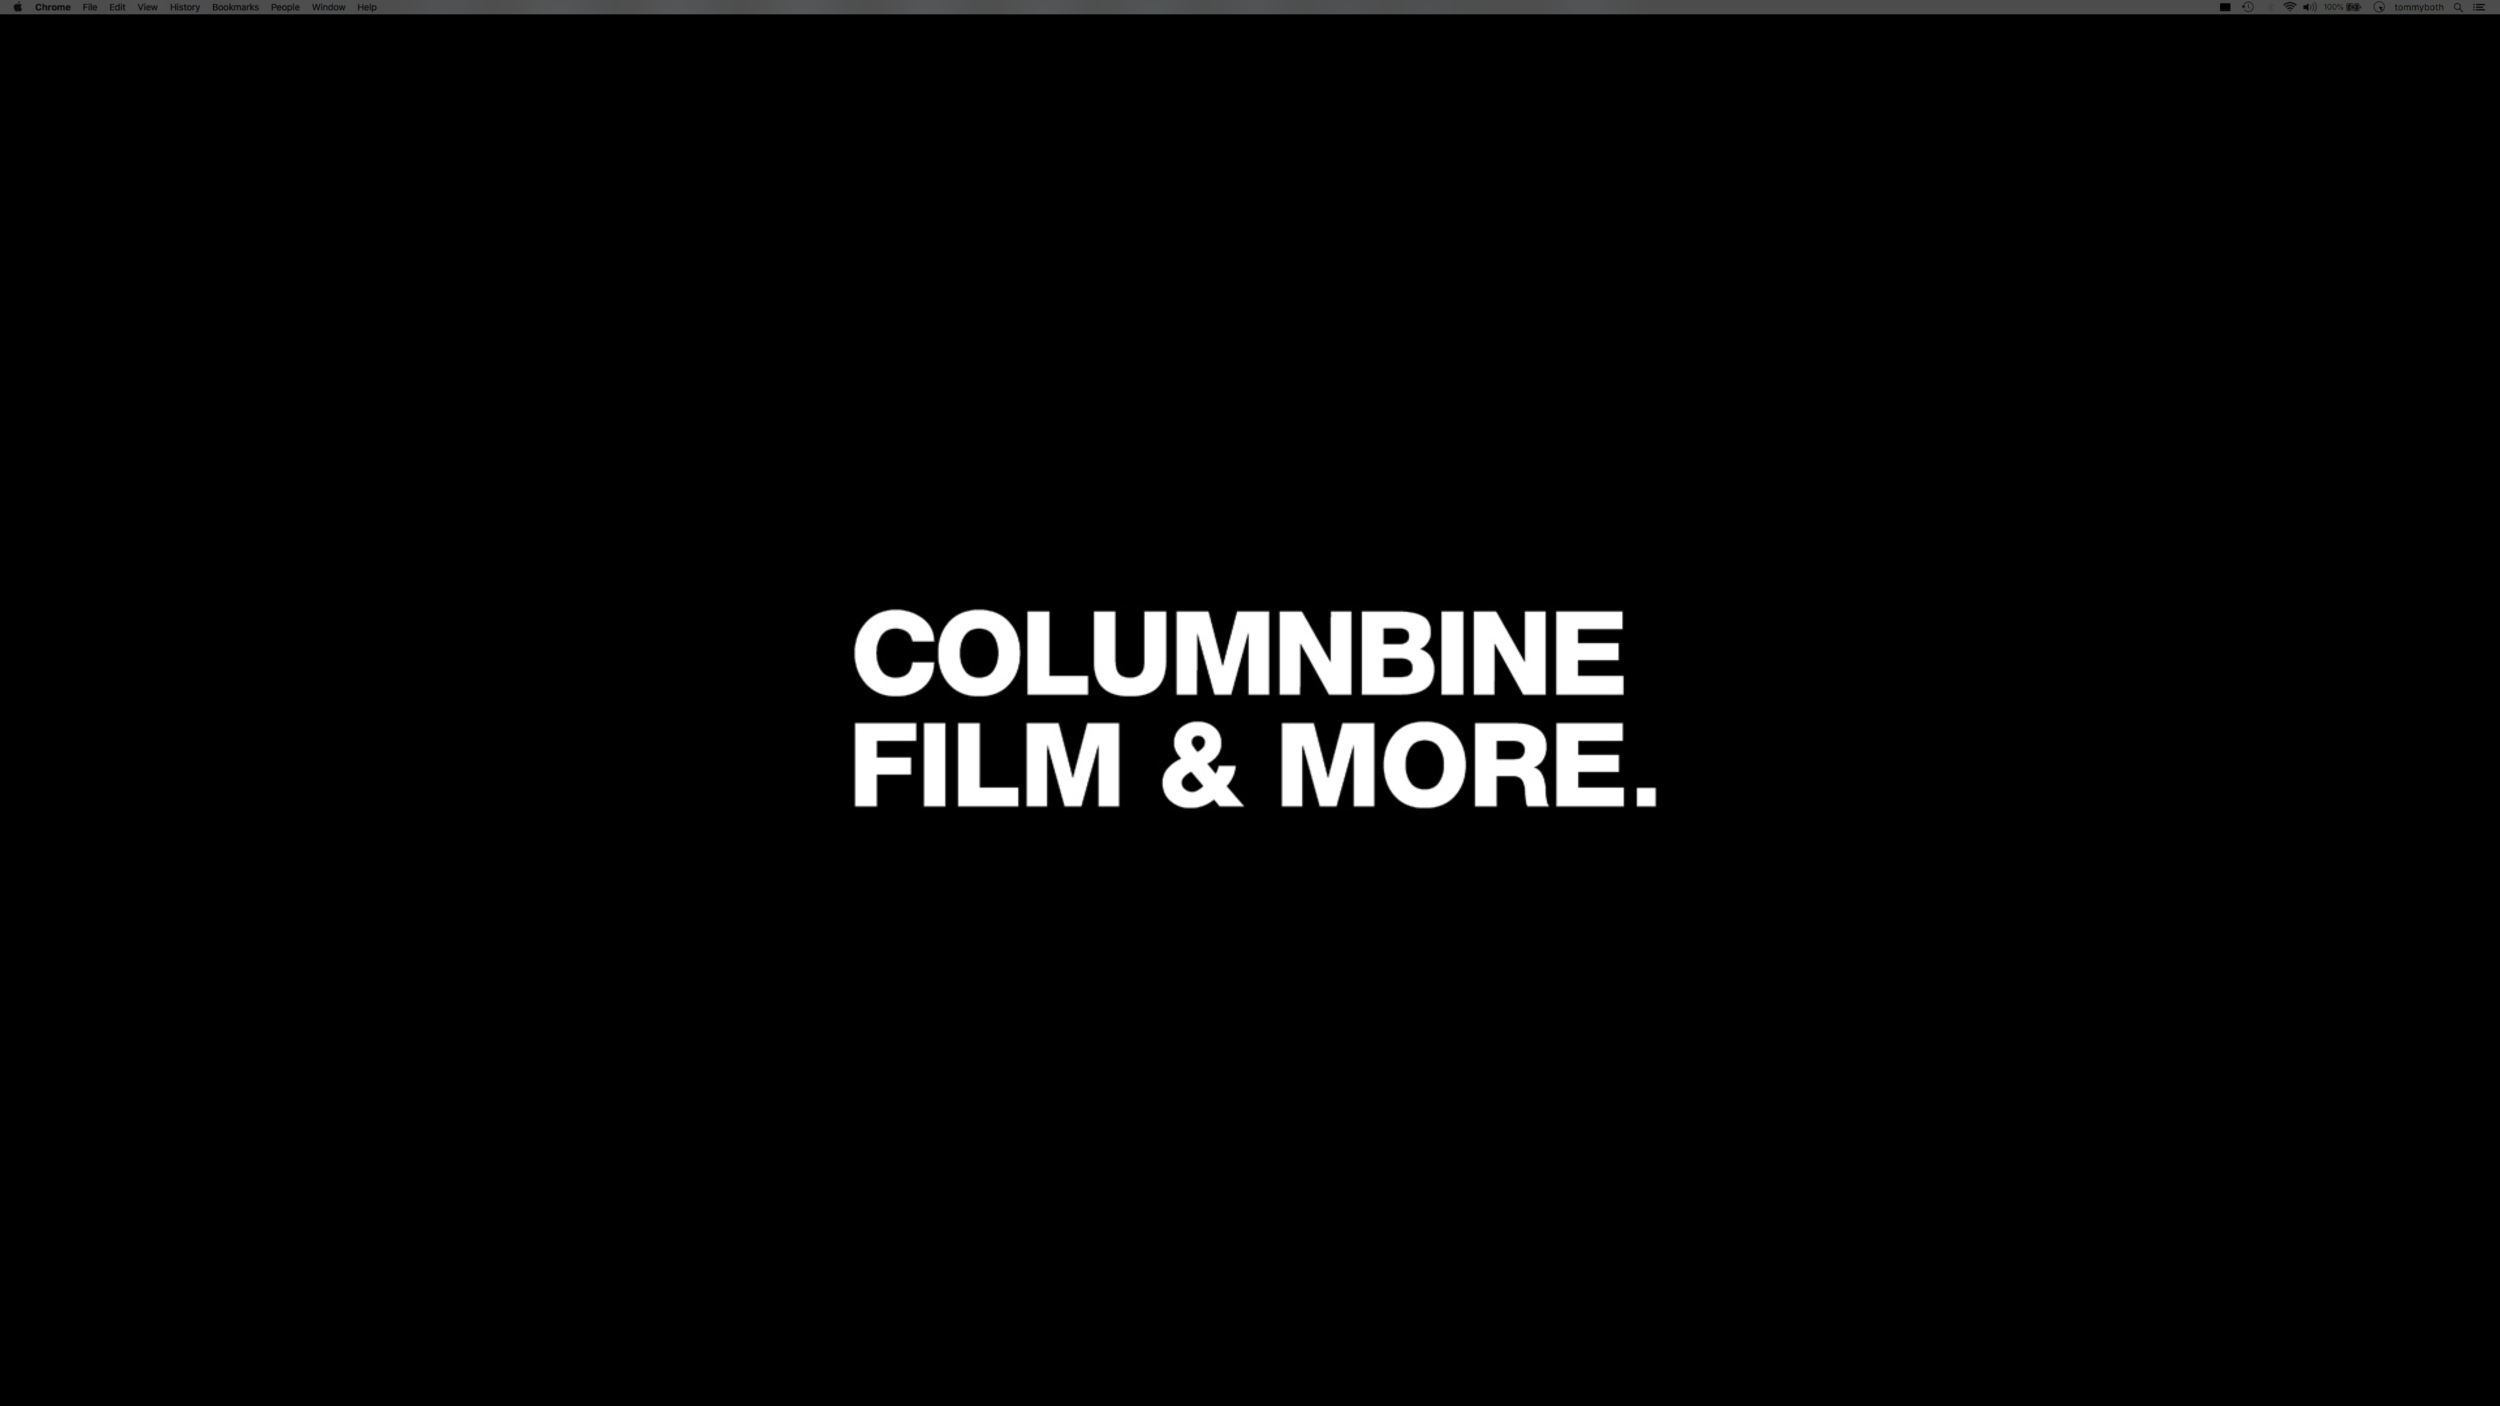 COLUMNBINE_FILM_LOGO.png